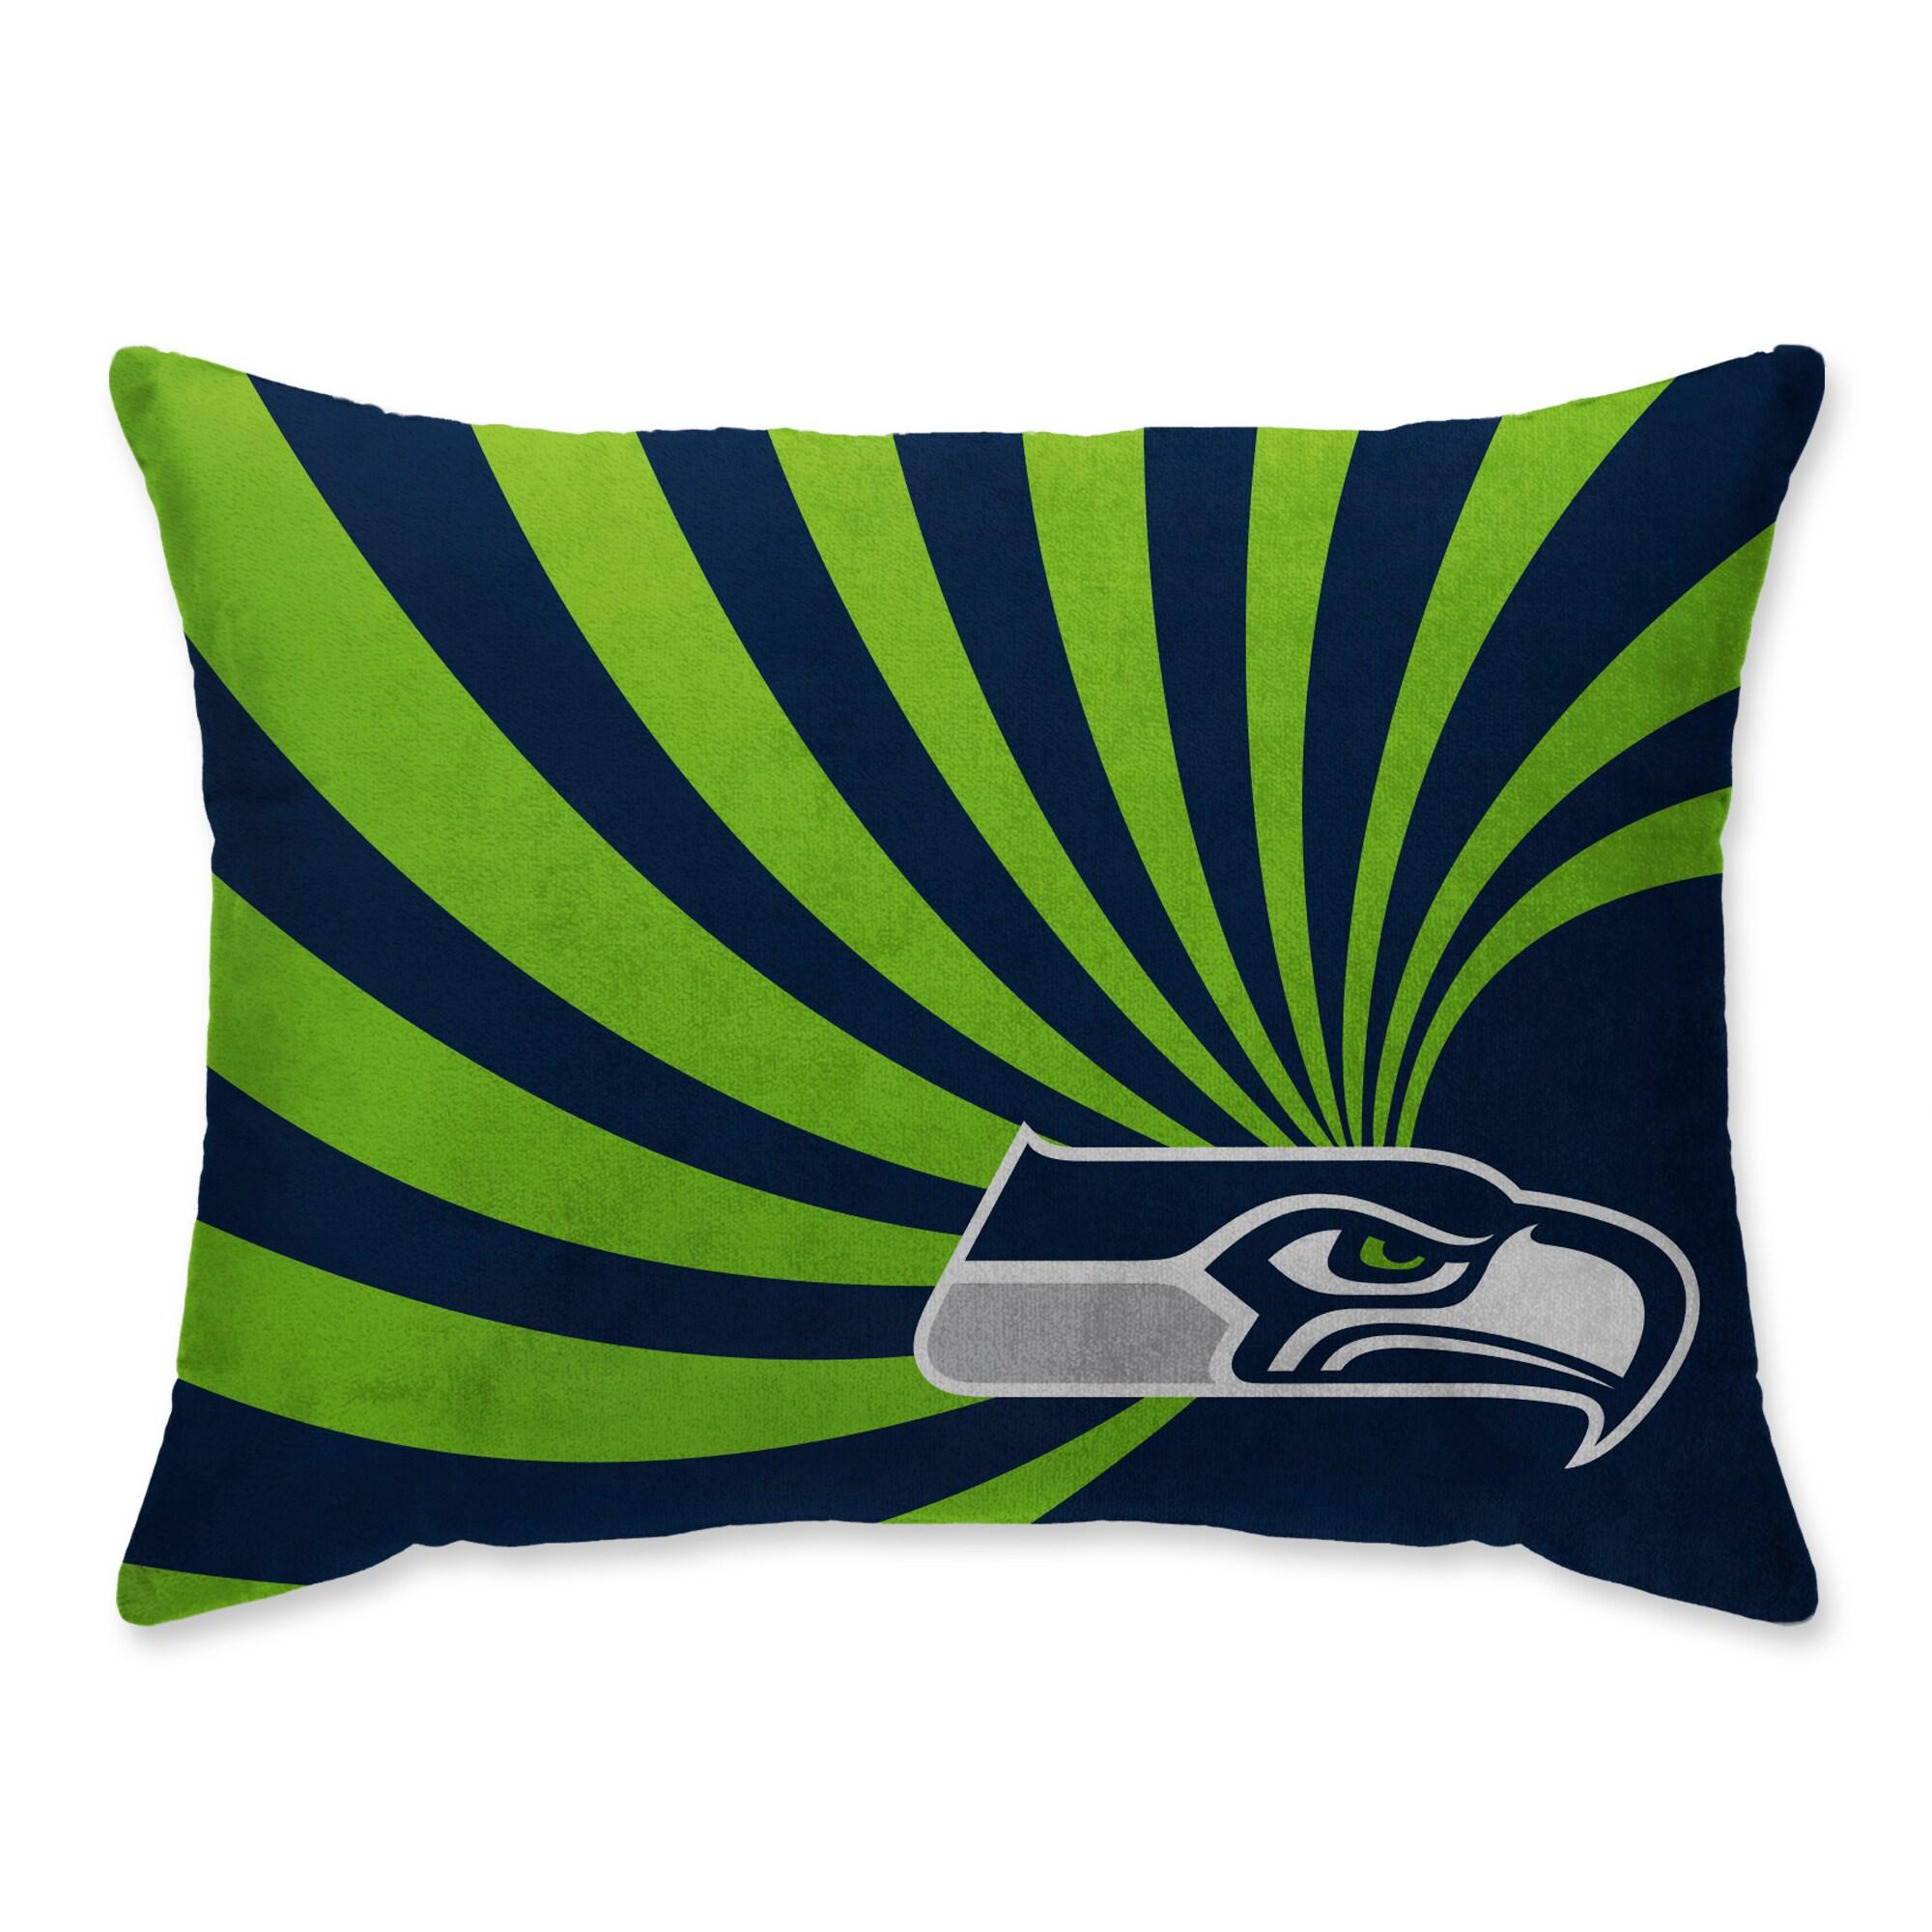 Seattle Seahawks Super Plush Mink Wave Bed Pillow - Blue